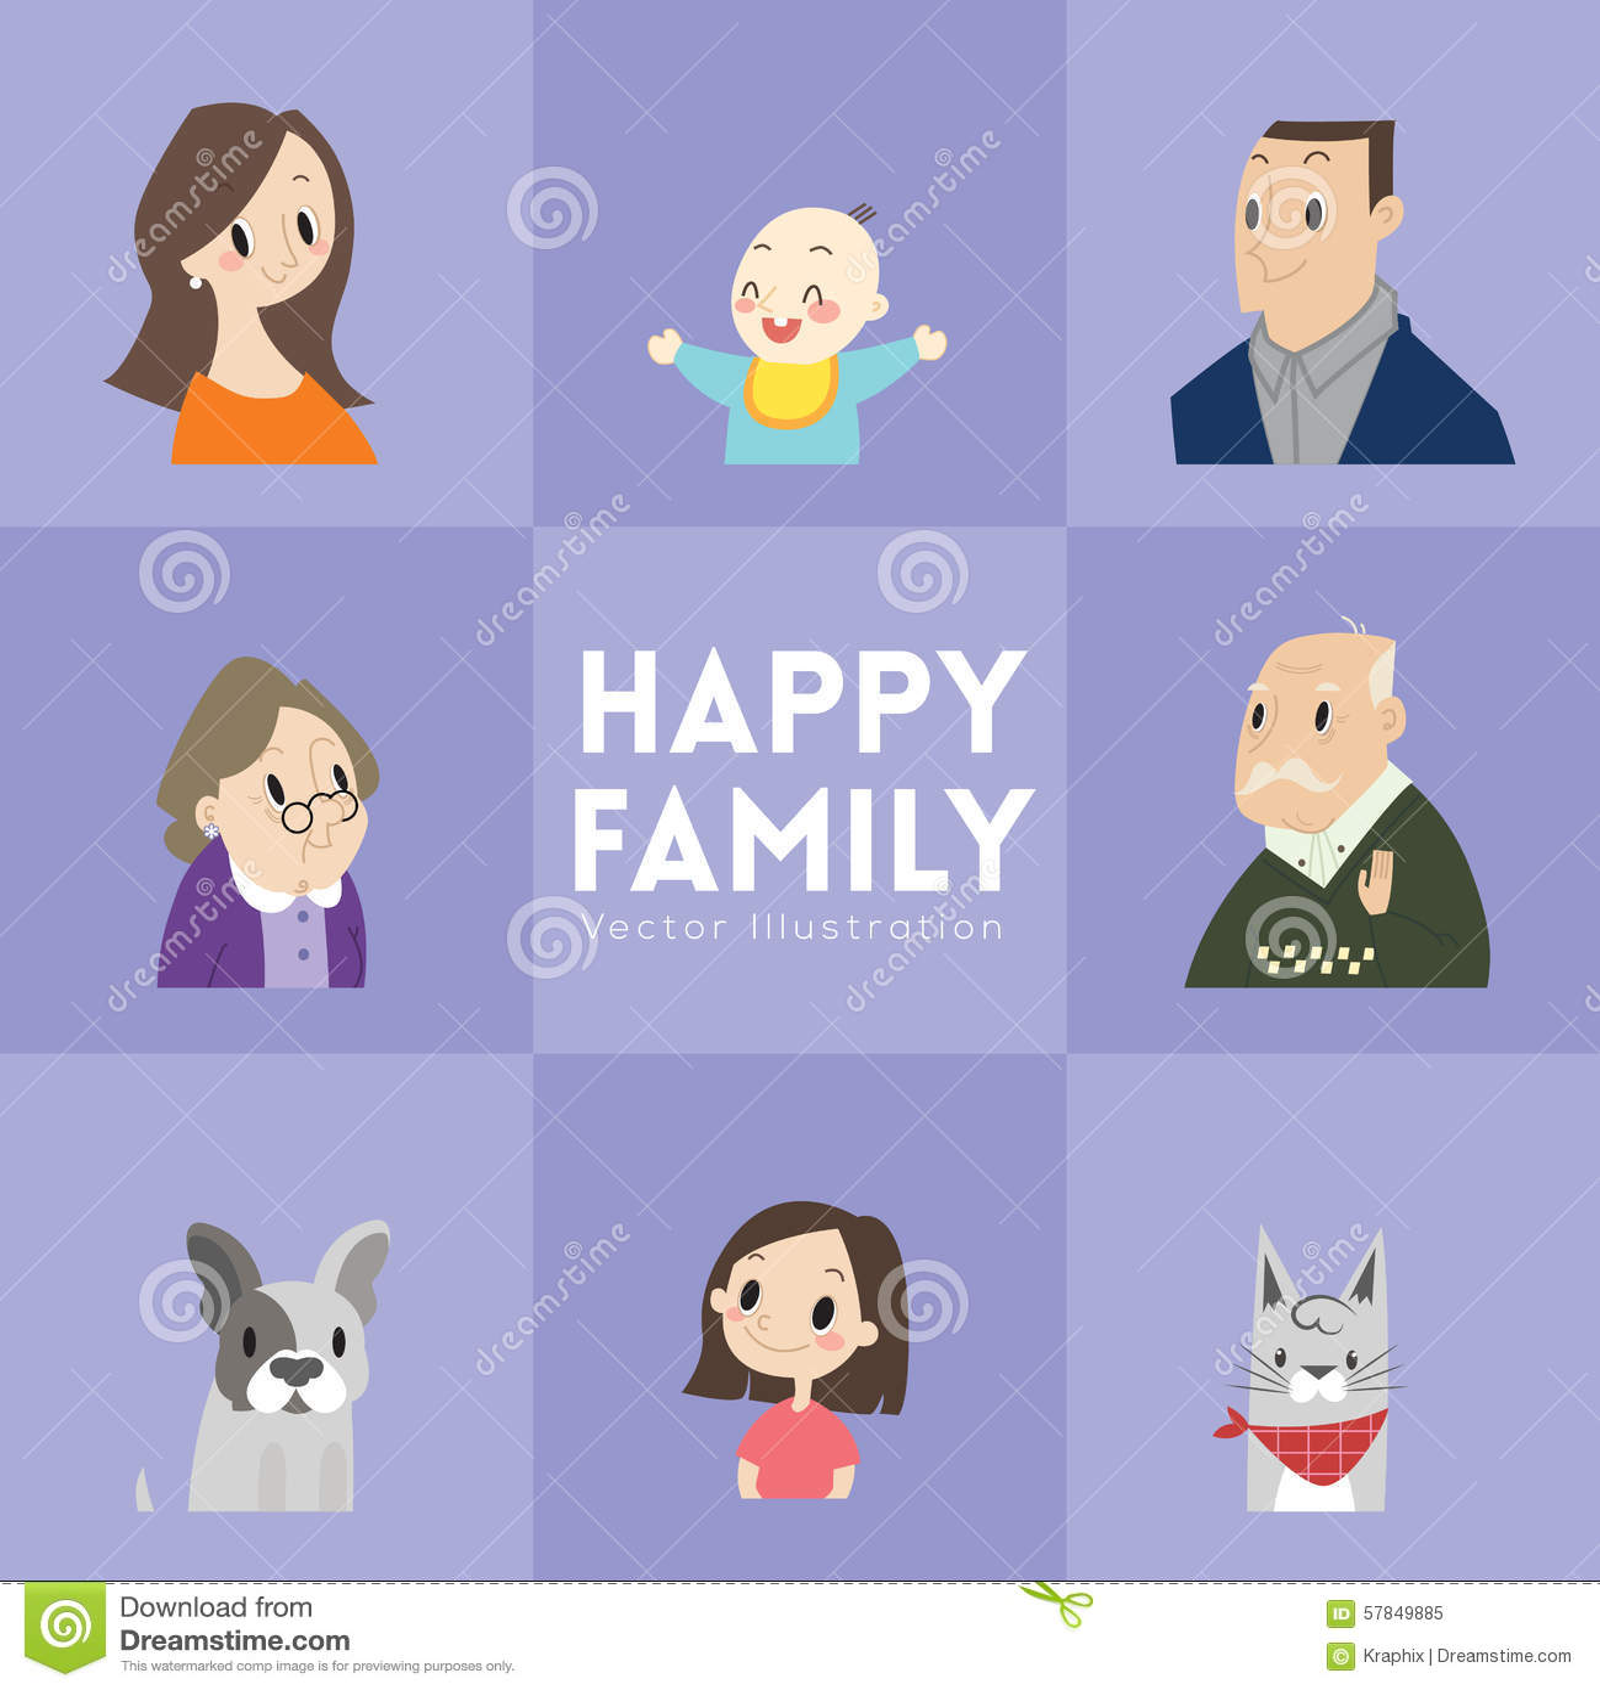 Big Happy Family Cartoon Illustration Illustration 57849885 Megapixl